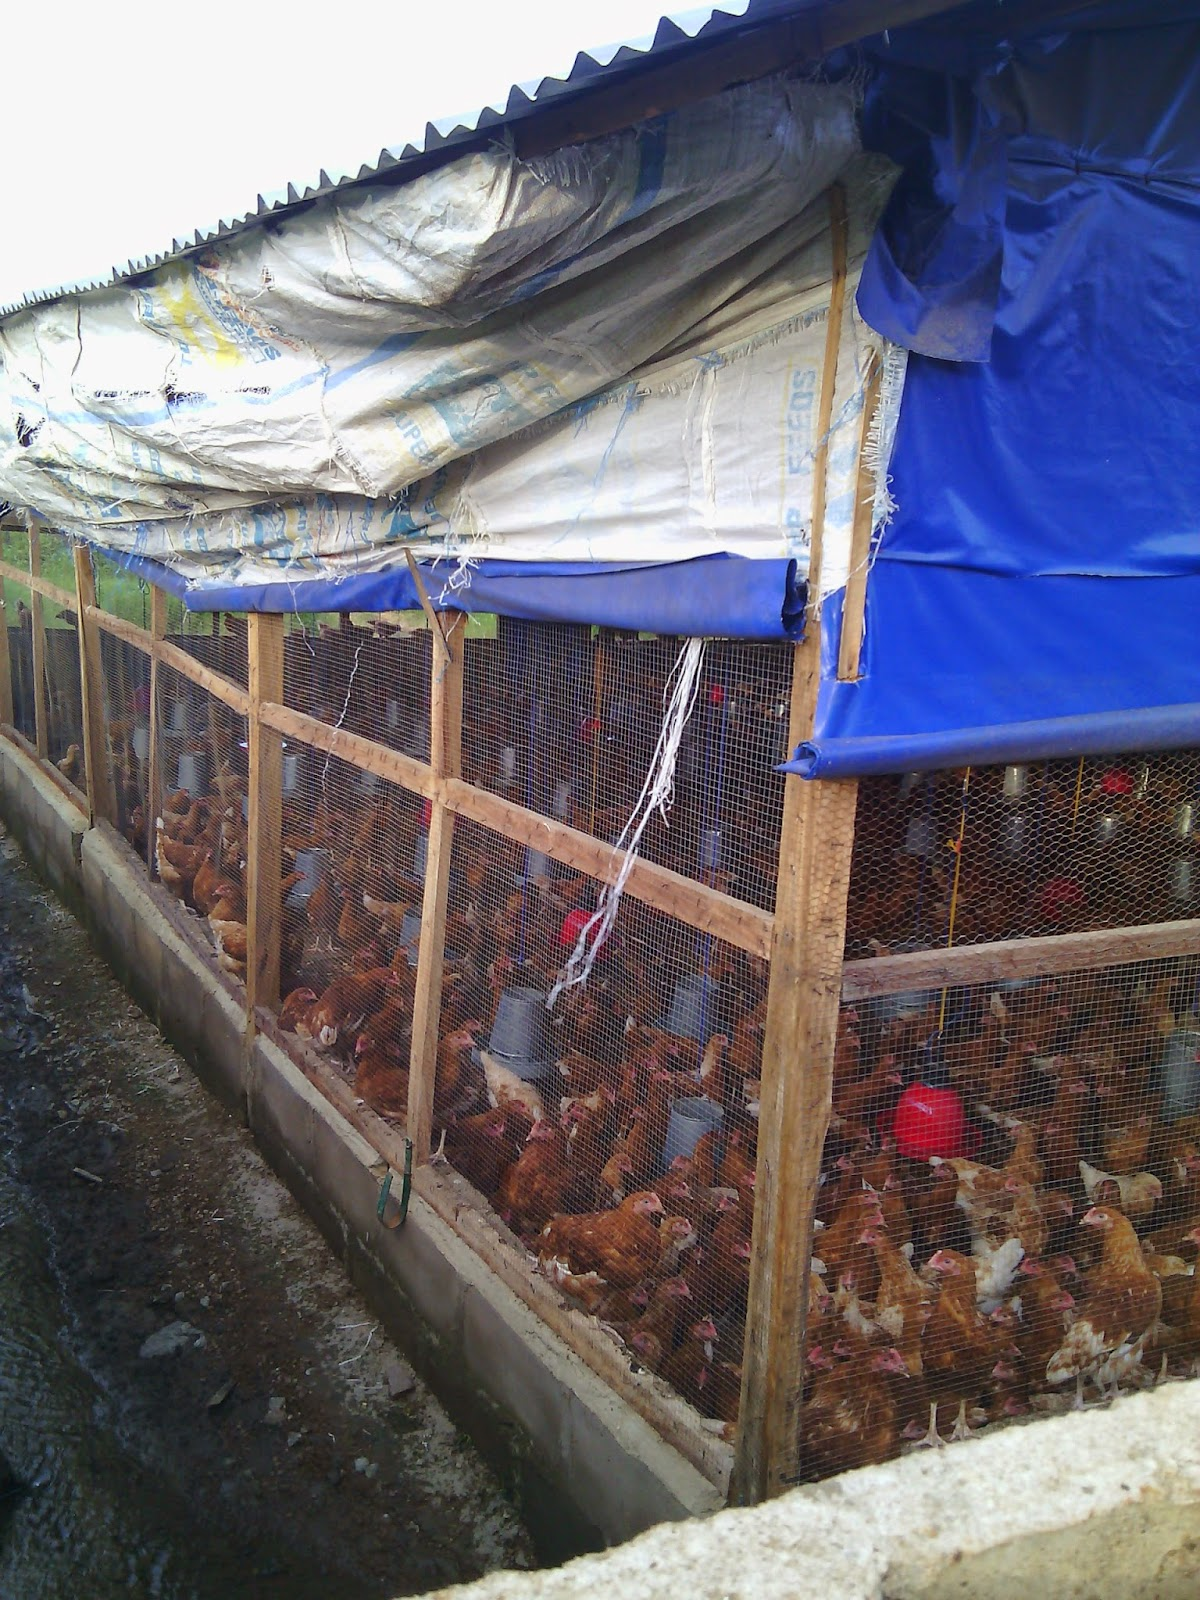 A 1000 layers poultry farm